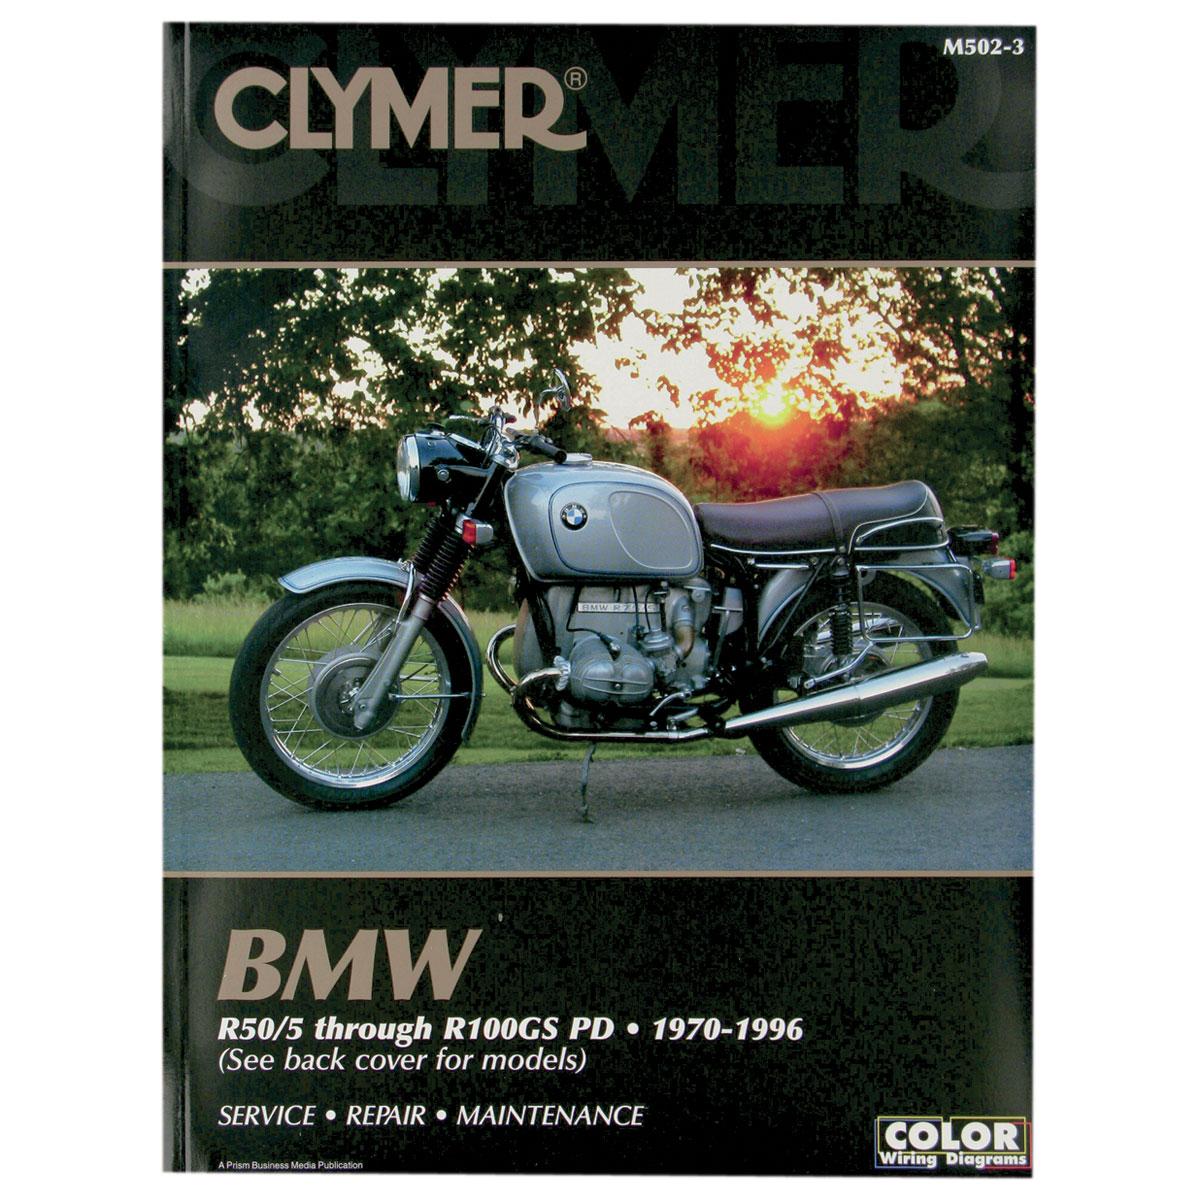 clymer bmw motorcycle repair manual 181 2346 j p cycles rh jpcycles com bmw motorcycle service manual pdf Electrical Maintenance Manuals